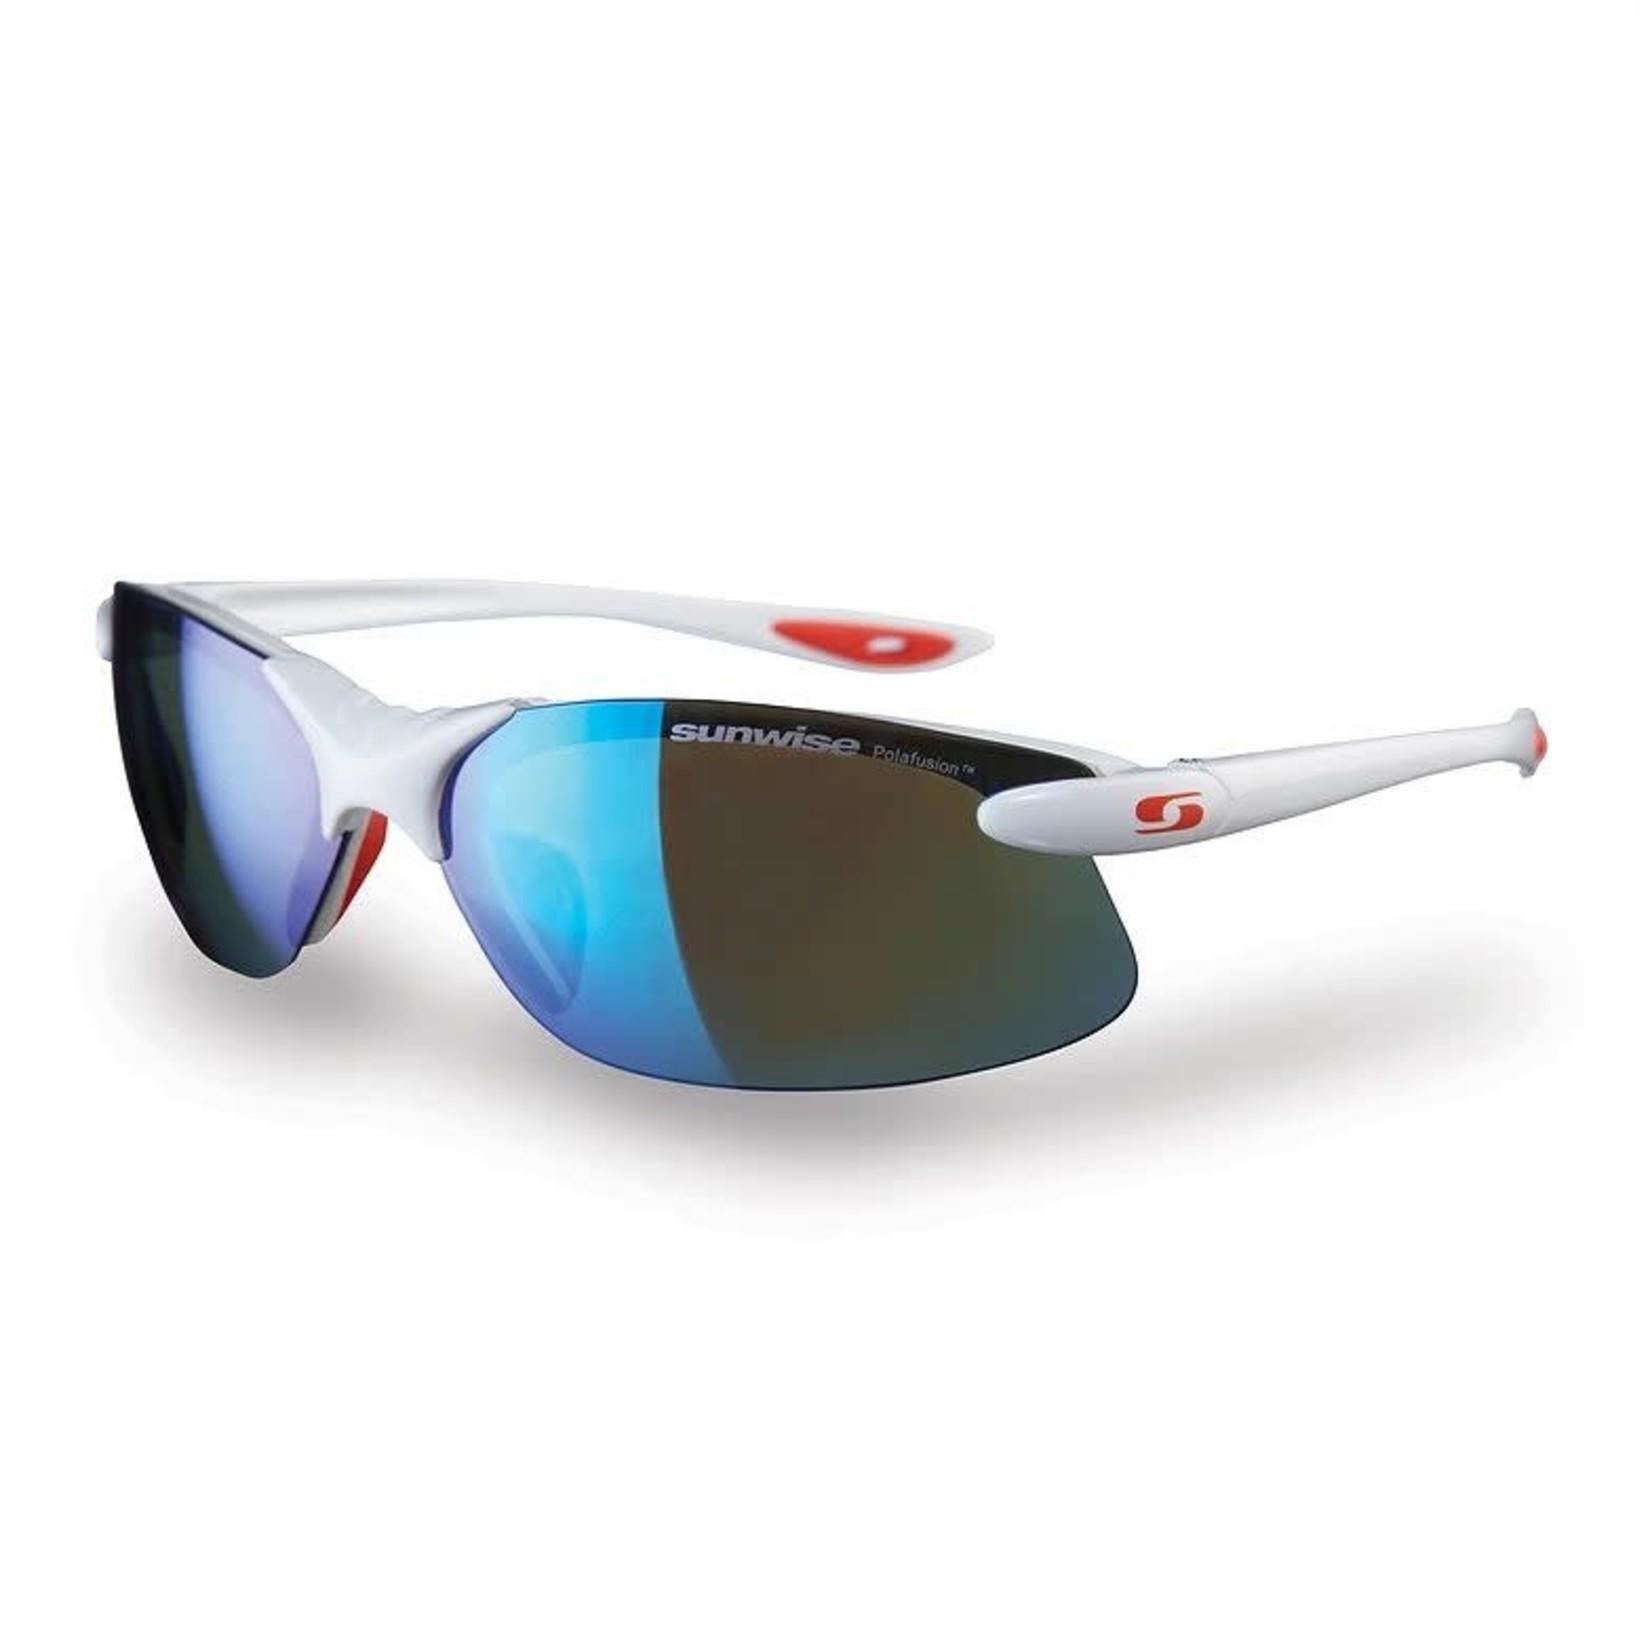 Sunwise Greenwich Sunglasses White/Red